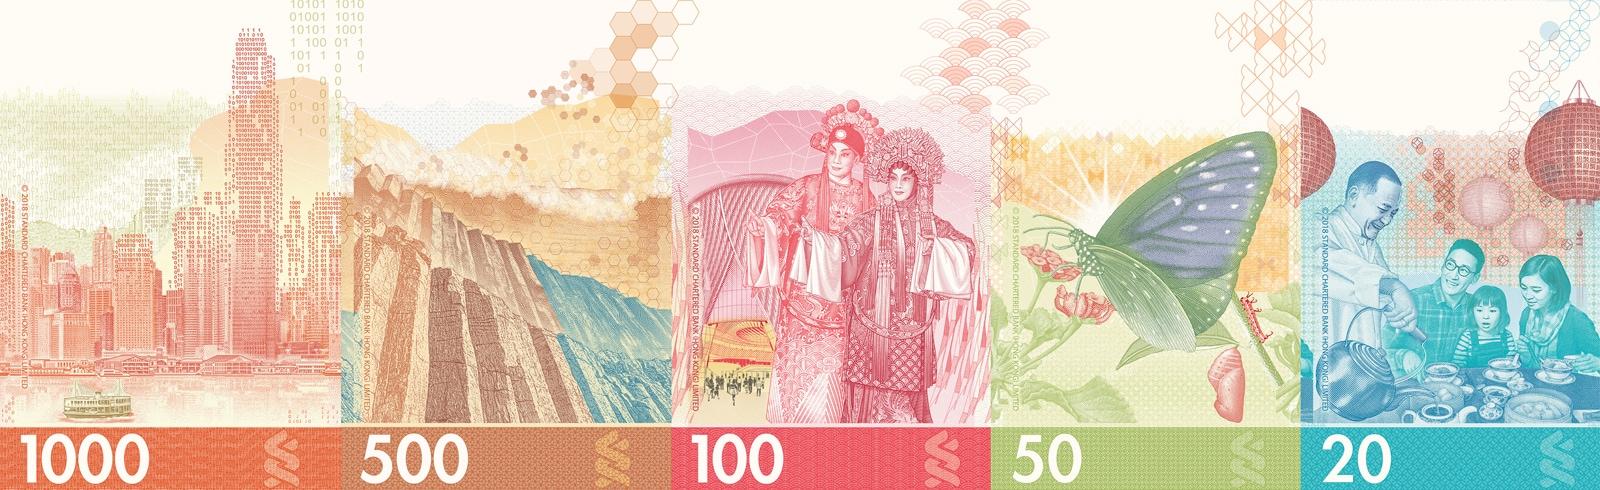 Hk banknotes series lion rock